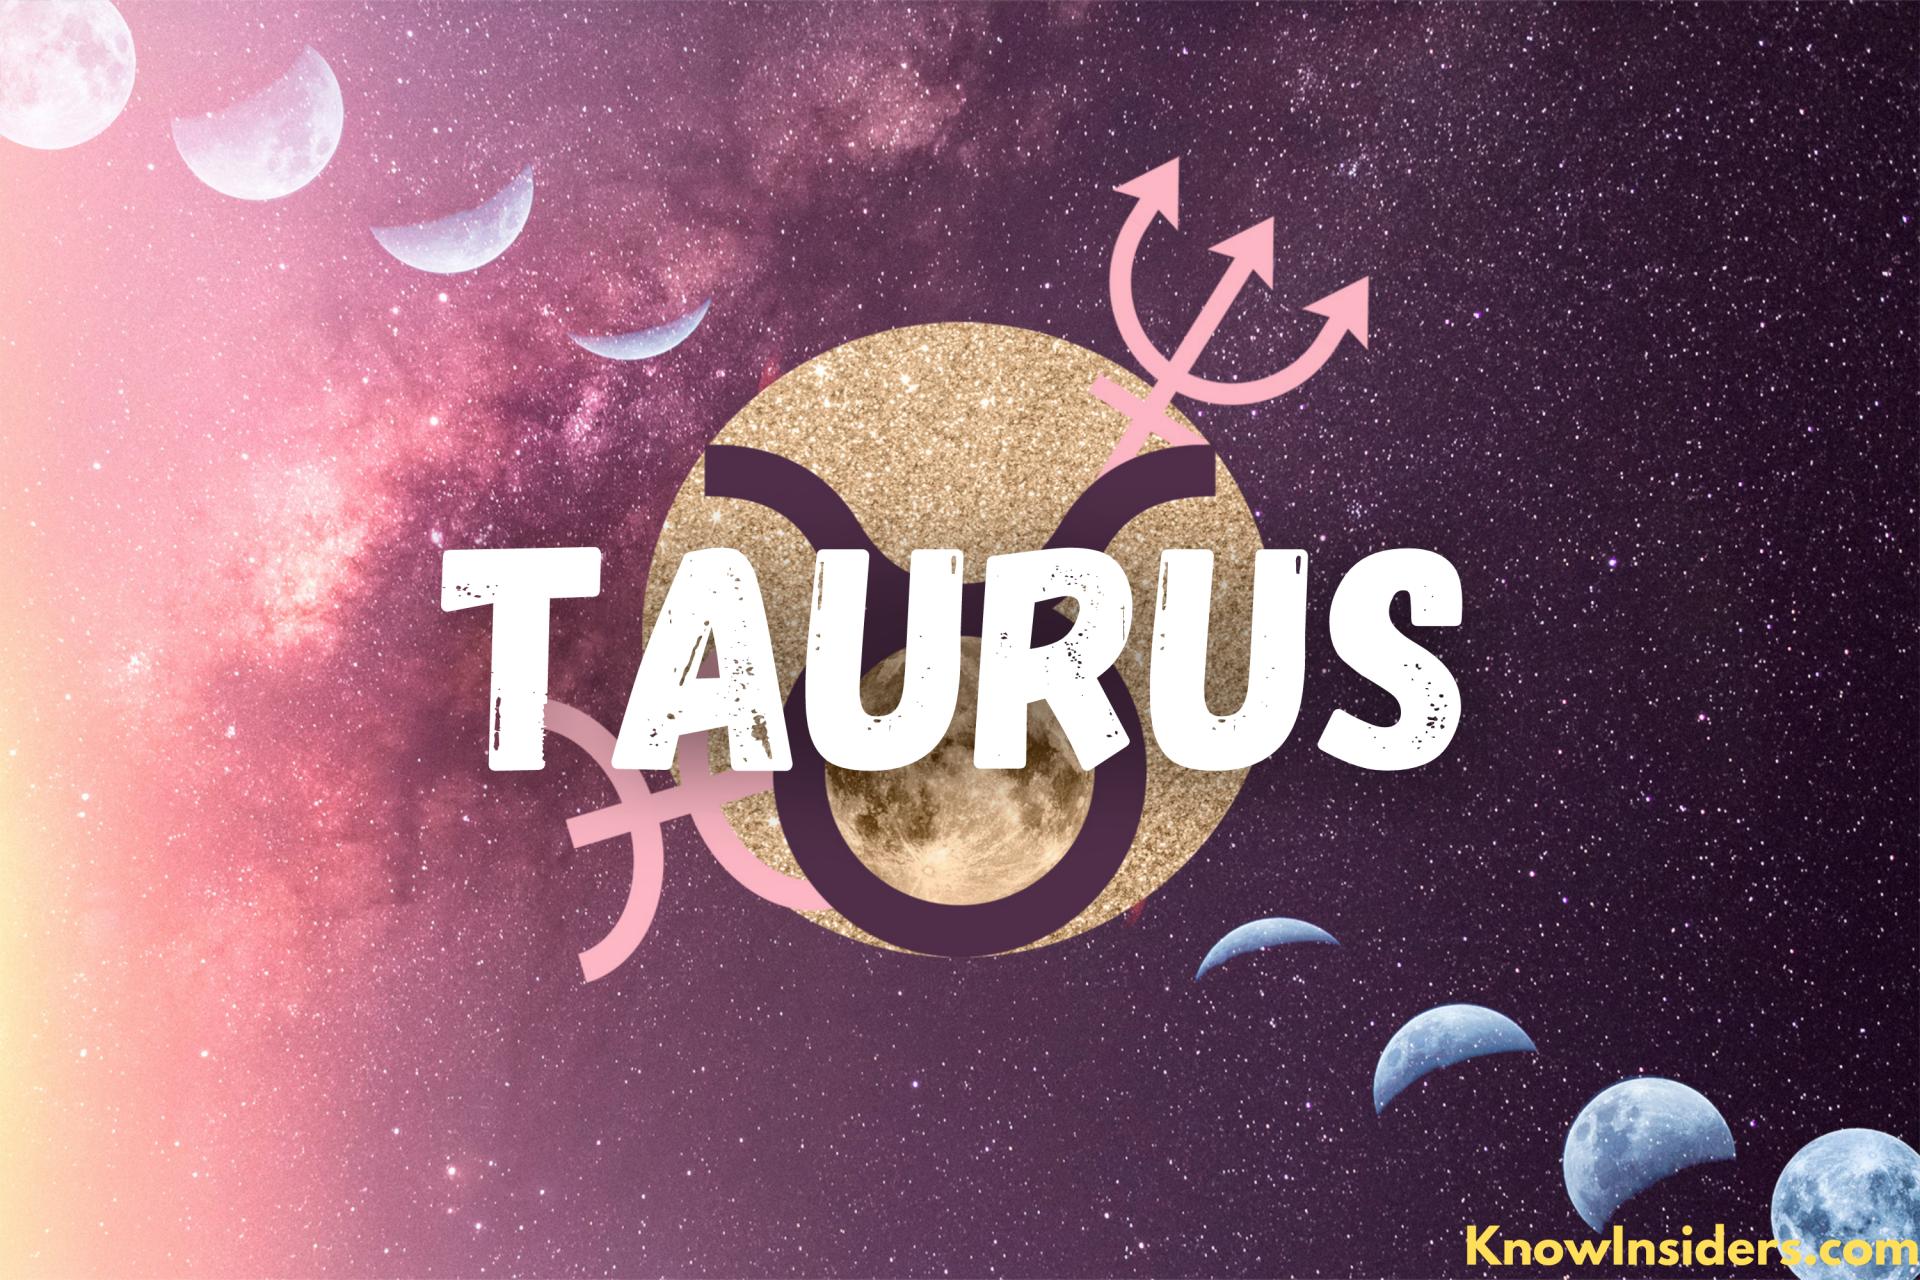 Taurus Zodiac Sign. Photo: Knowinsiders.